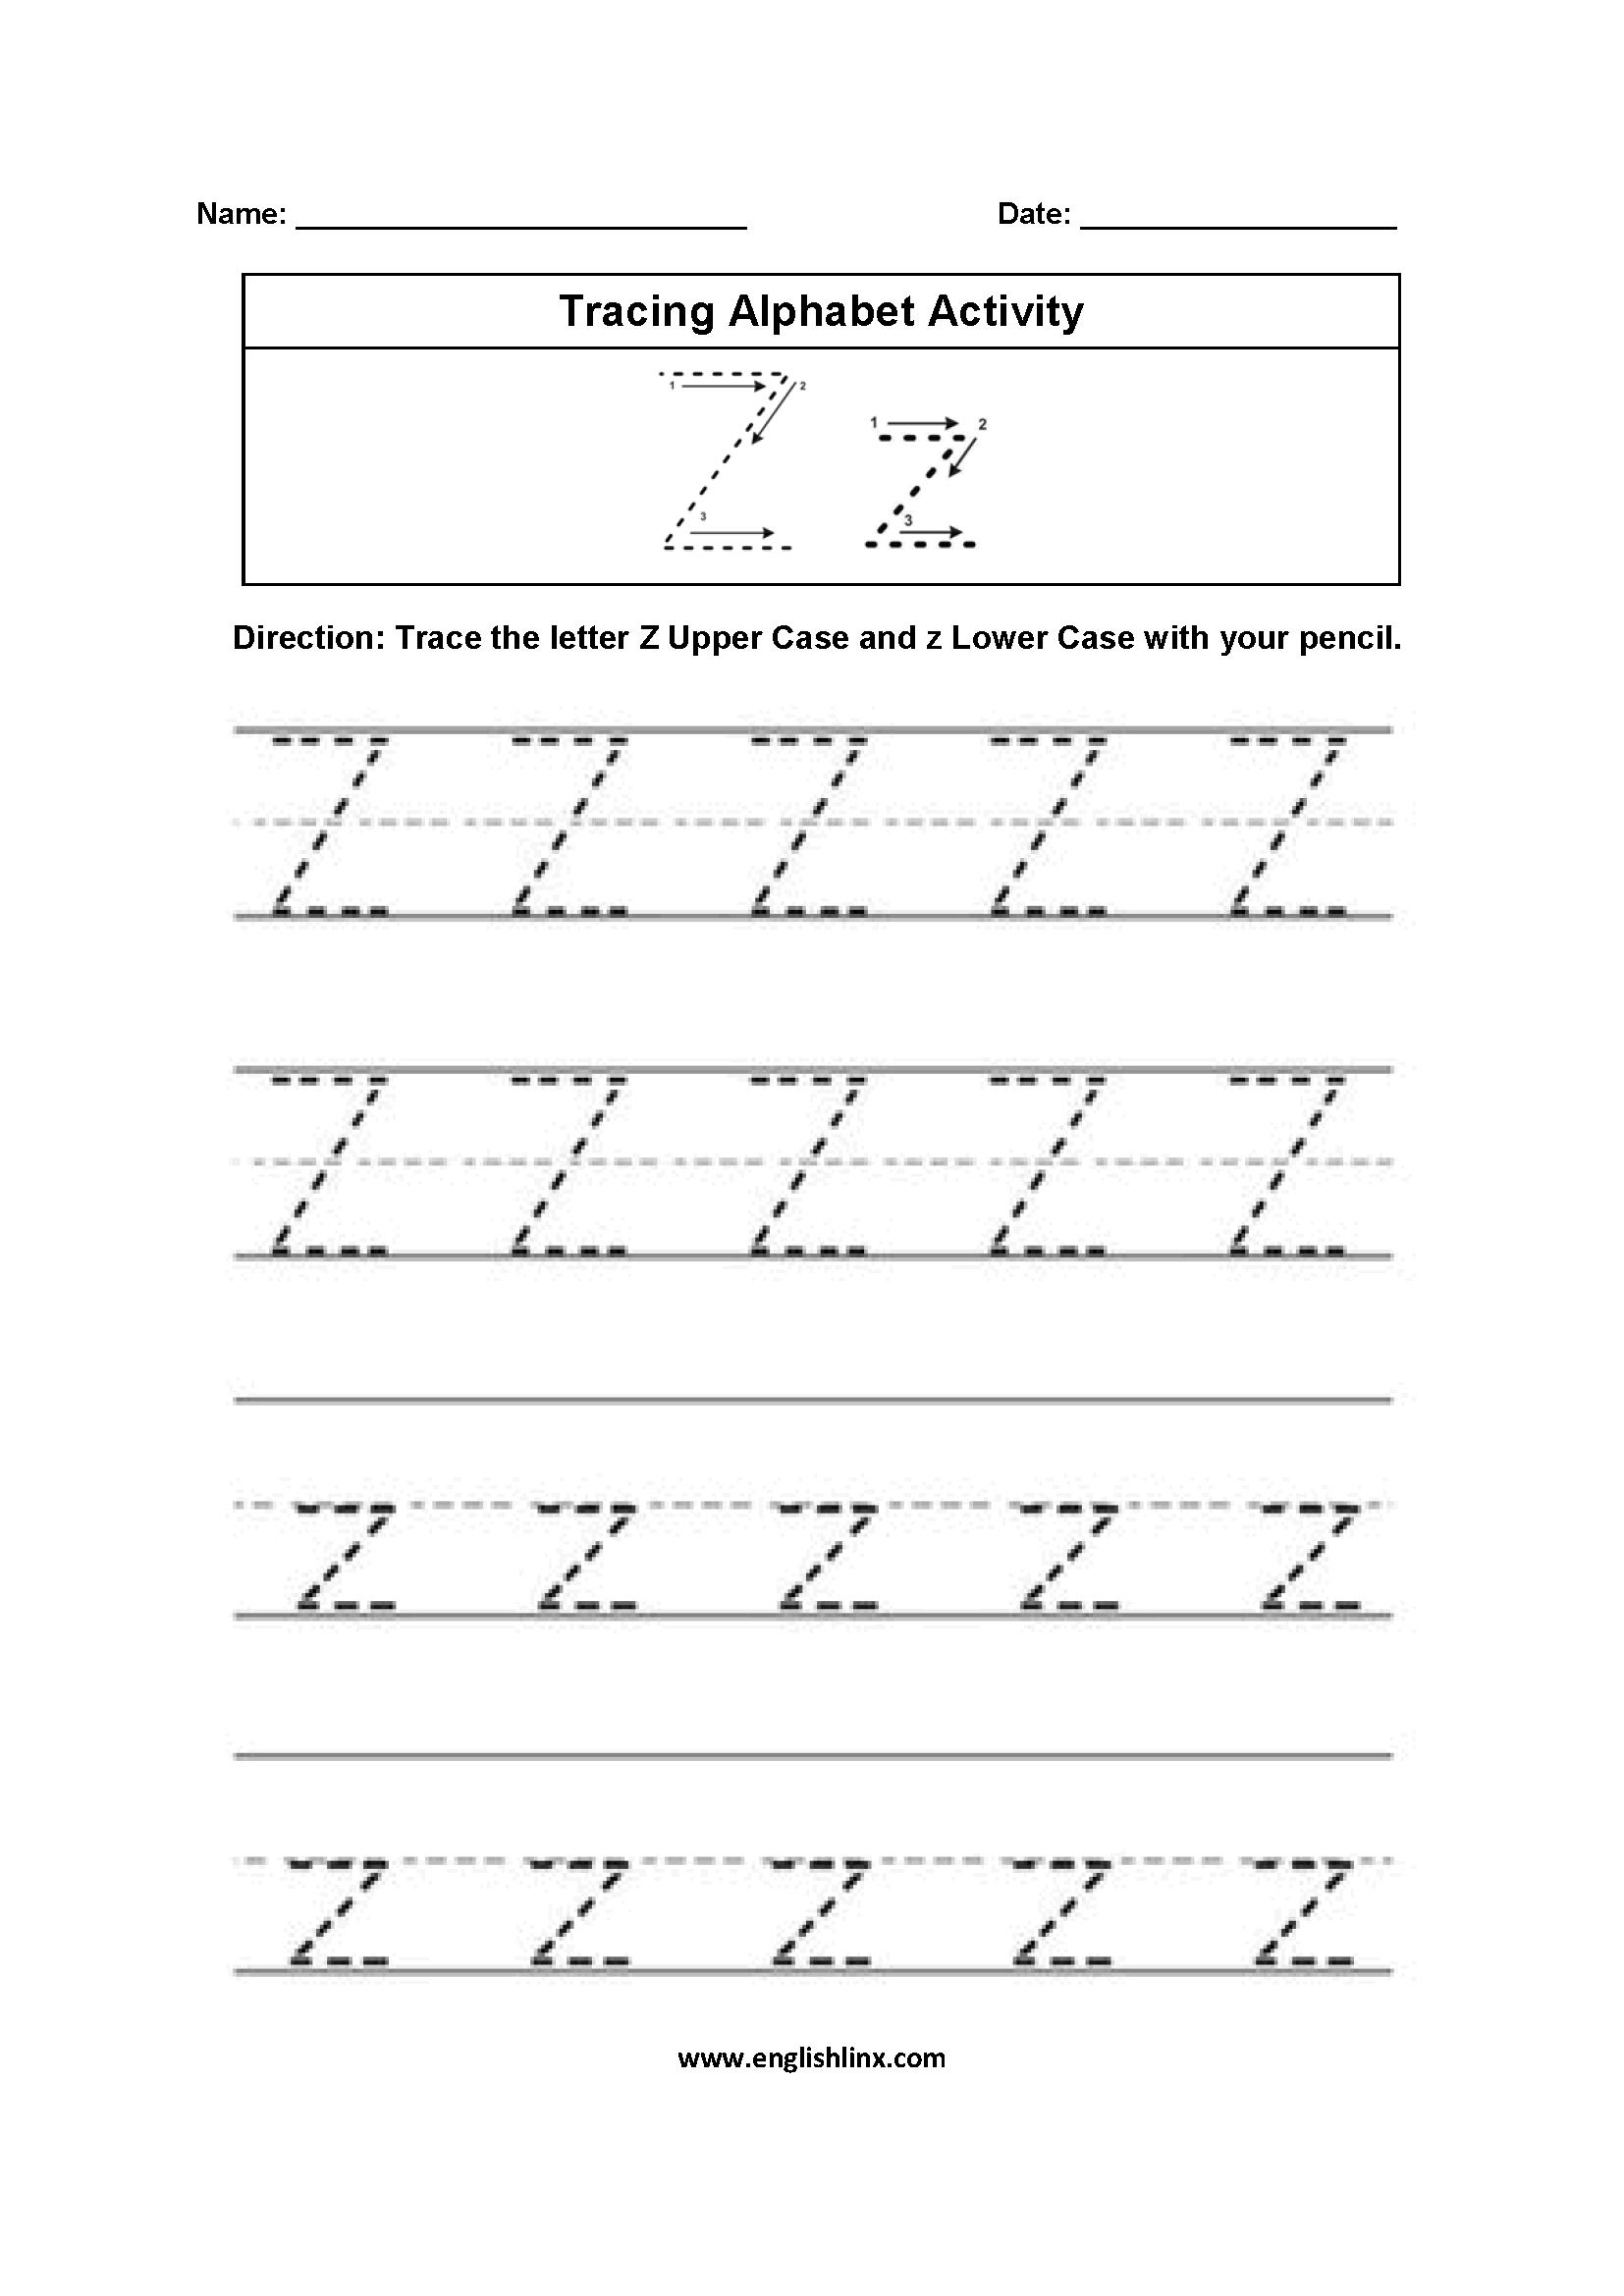 A To Z Alphabet Worksheets Pdf لم يسبق له مثيل الصور + Tier3.xyz inside Z Letter Tracing